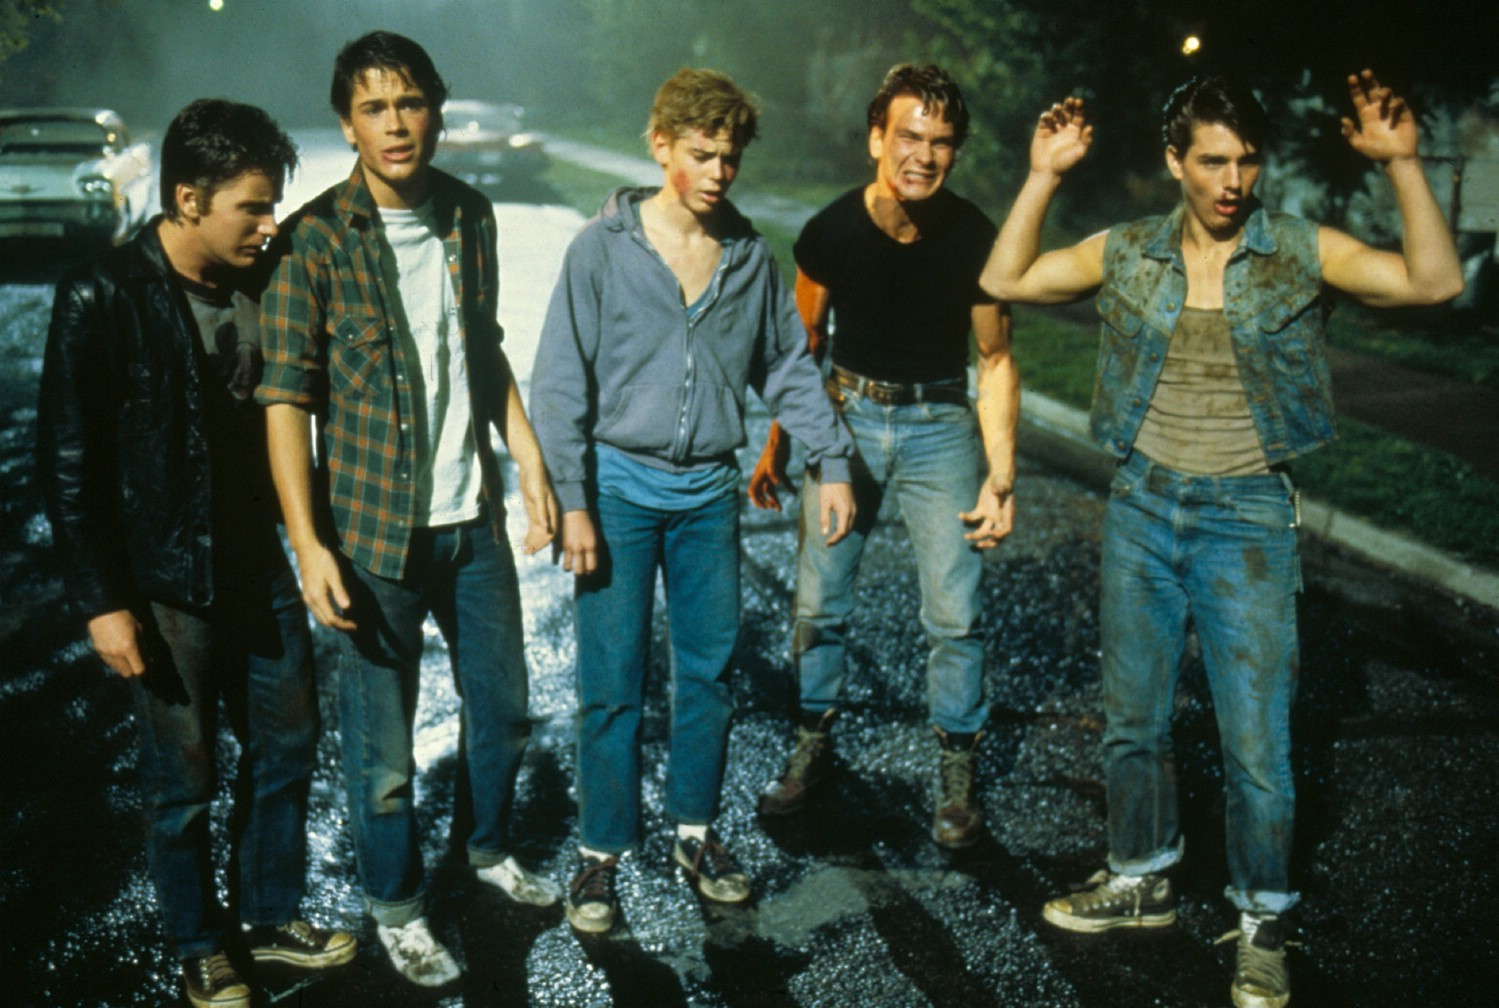 C. Thomas Howell,Matt Dillon,Patrick Swayze,Rob Lowe,Tom Cruise